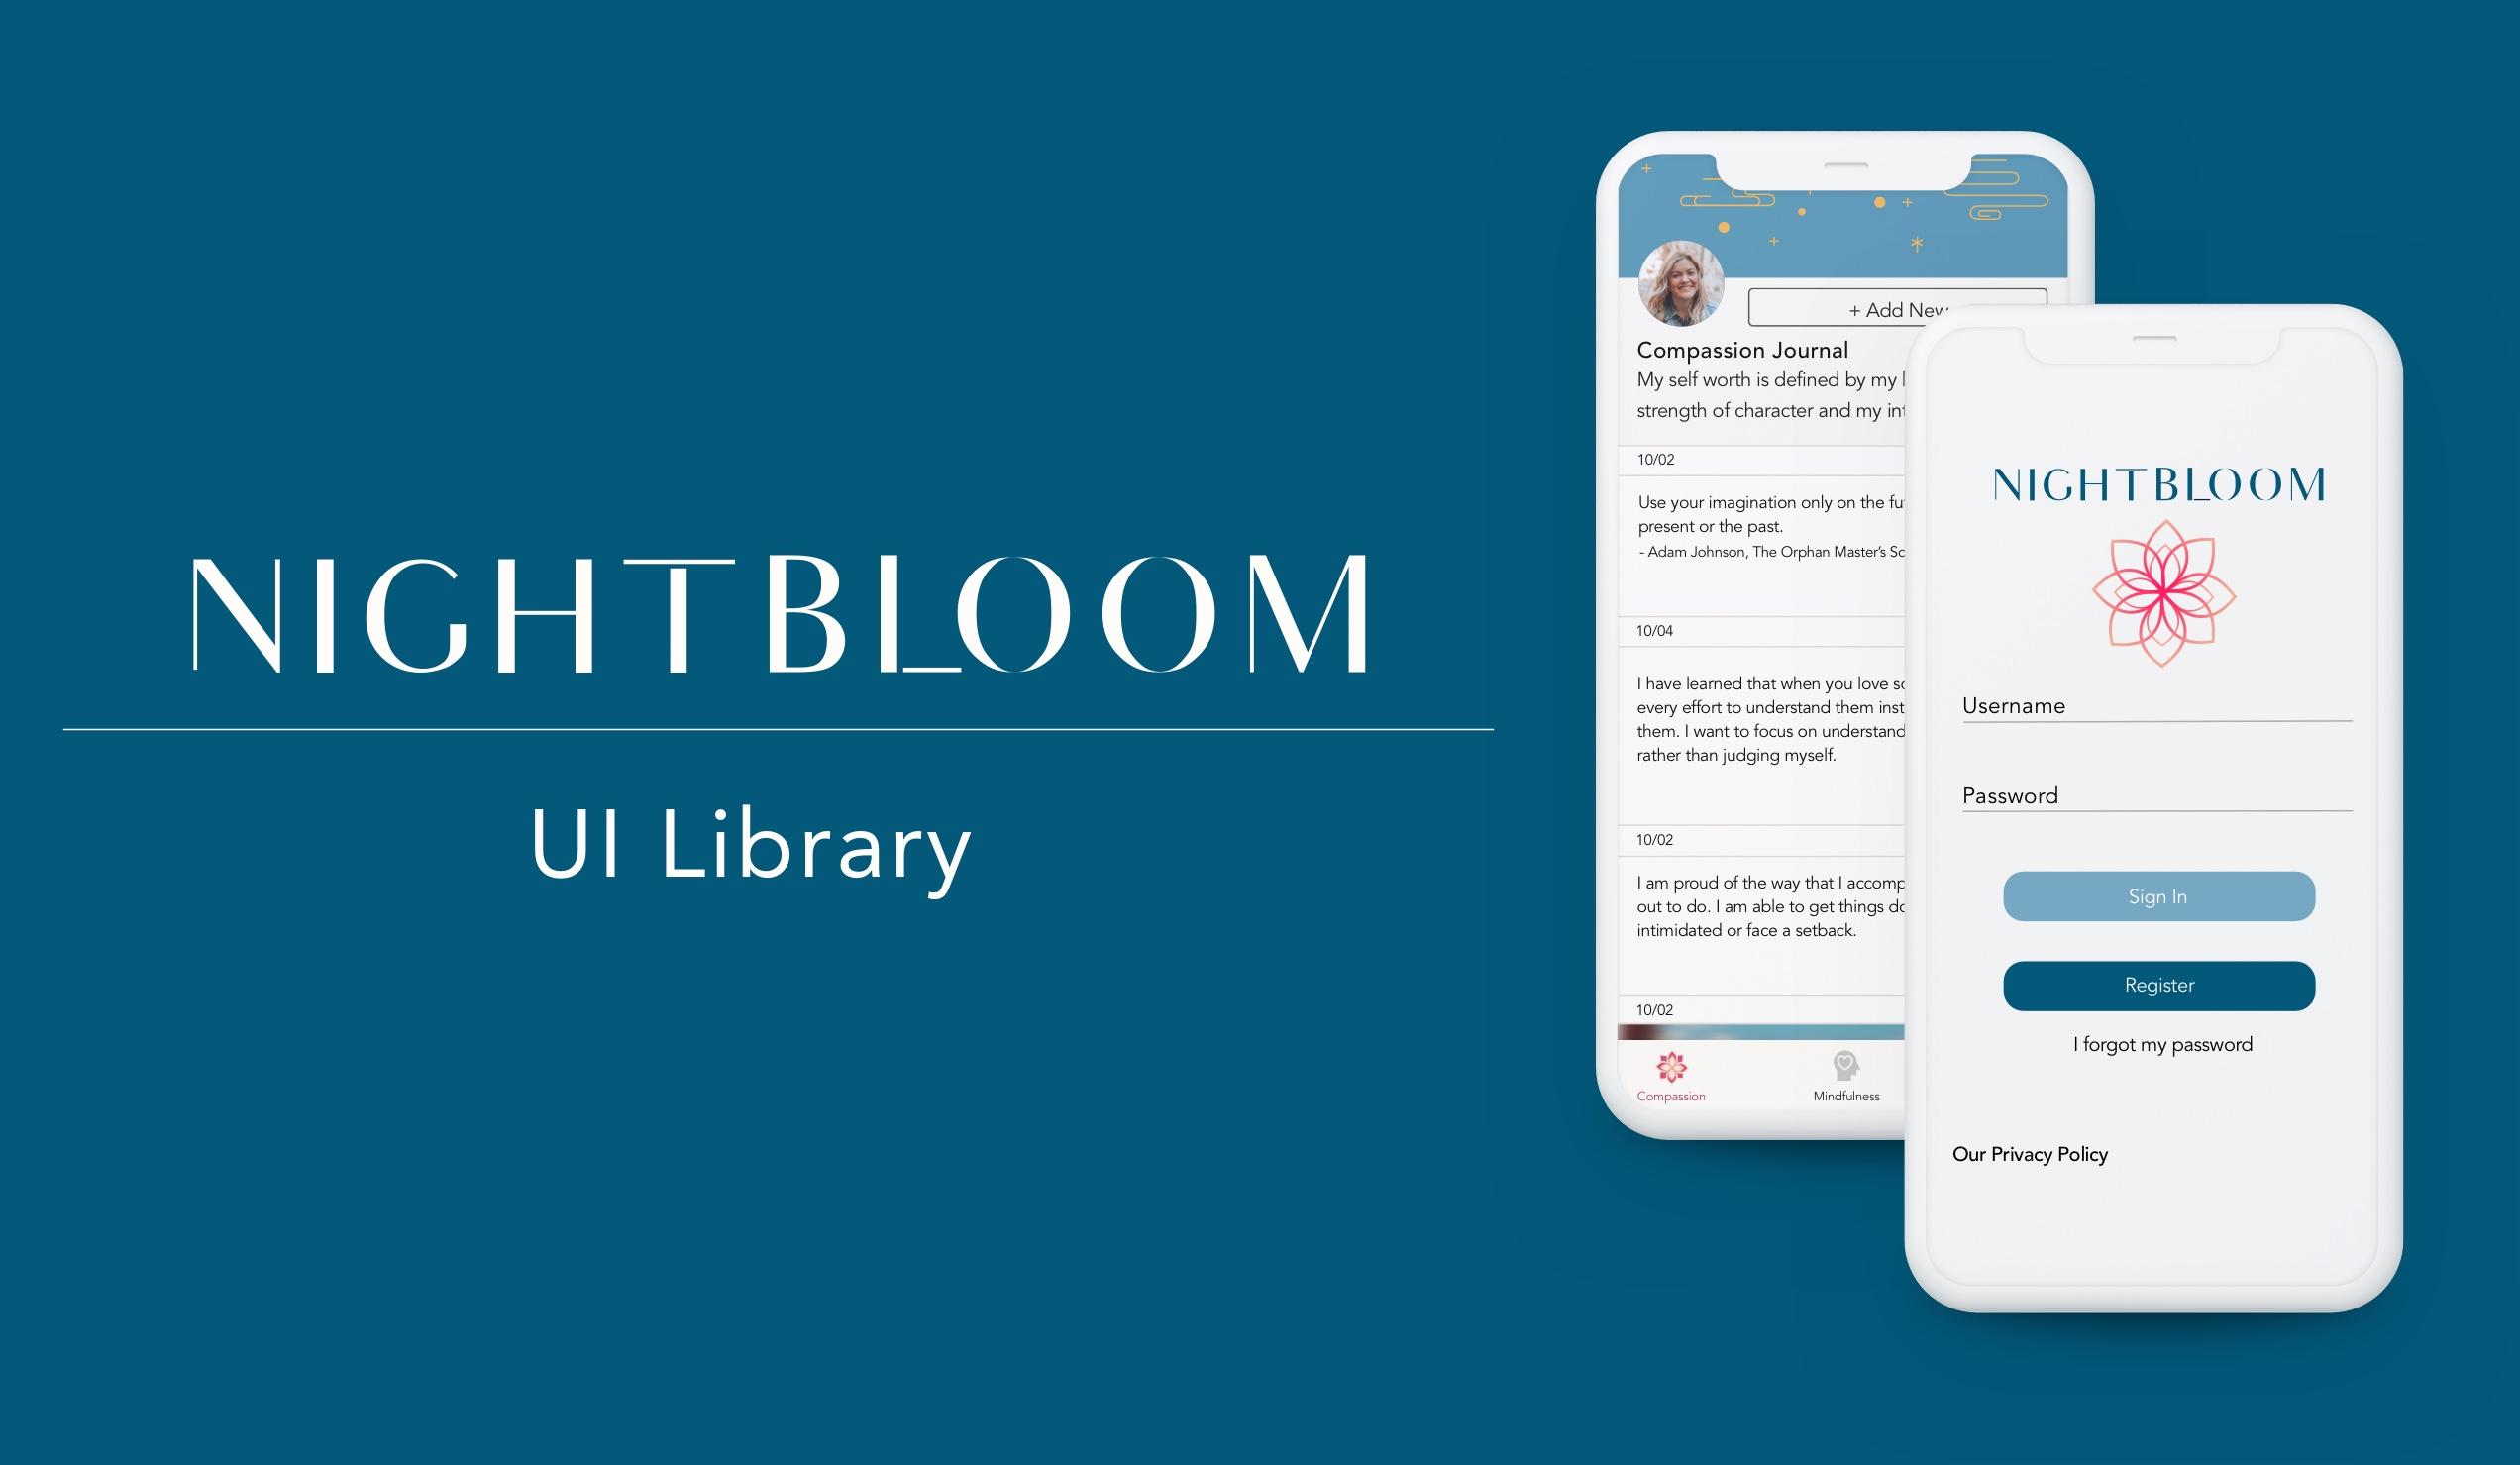 librarythumbnail_nightbloom